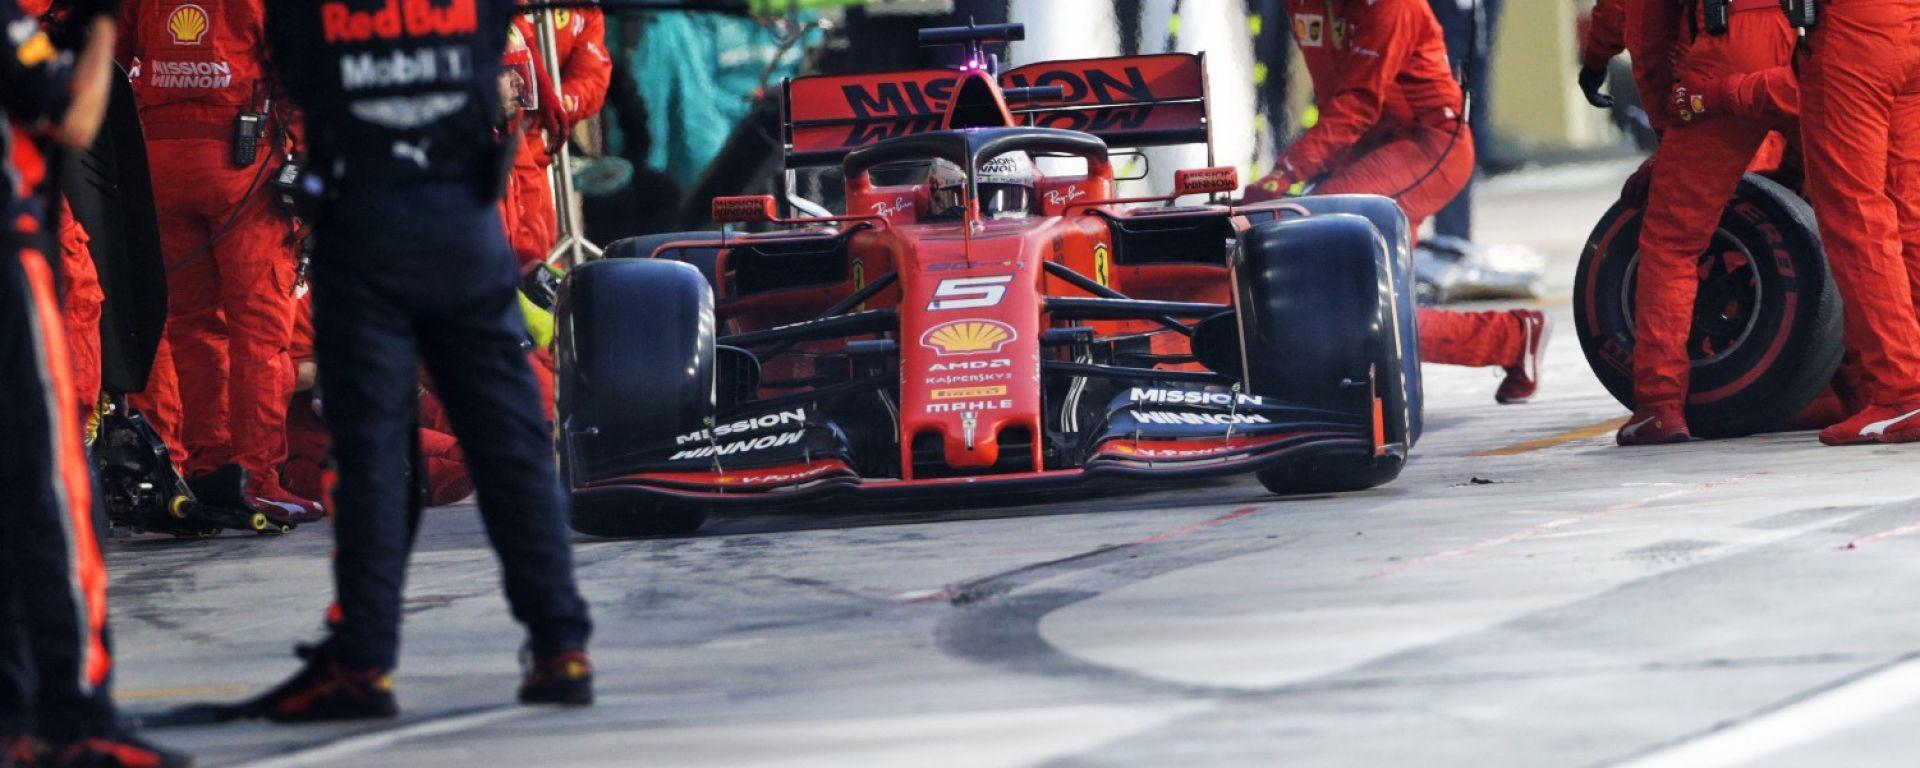 F1 GP Abu Dhabi 2019, Yas Marina: il pit stop di Sebastian Vettel (Ferrari)